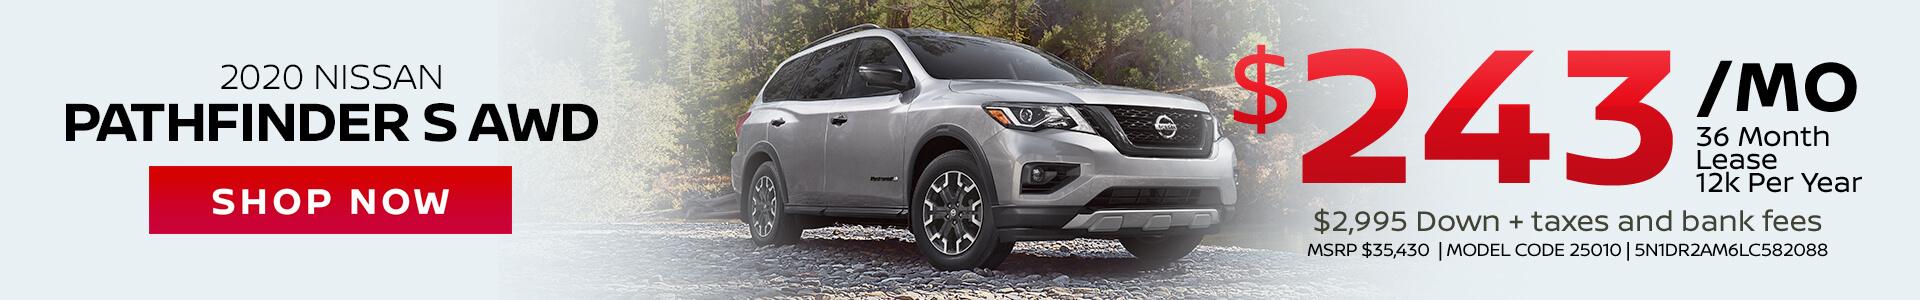 Nissan Pathfinder $243 Lease